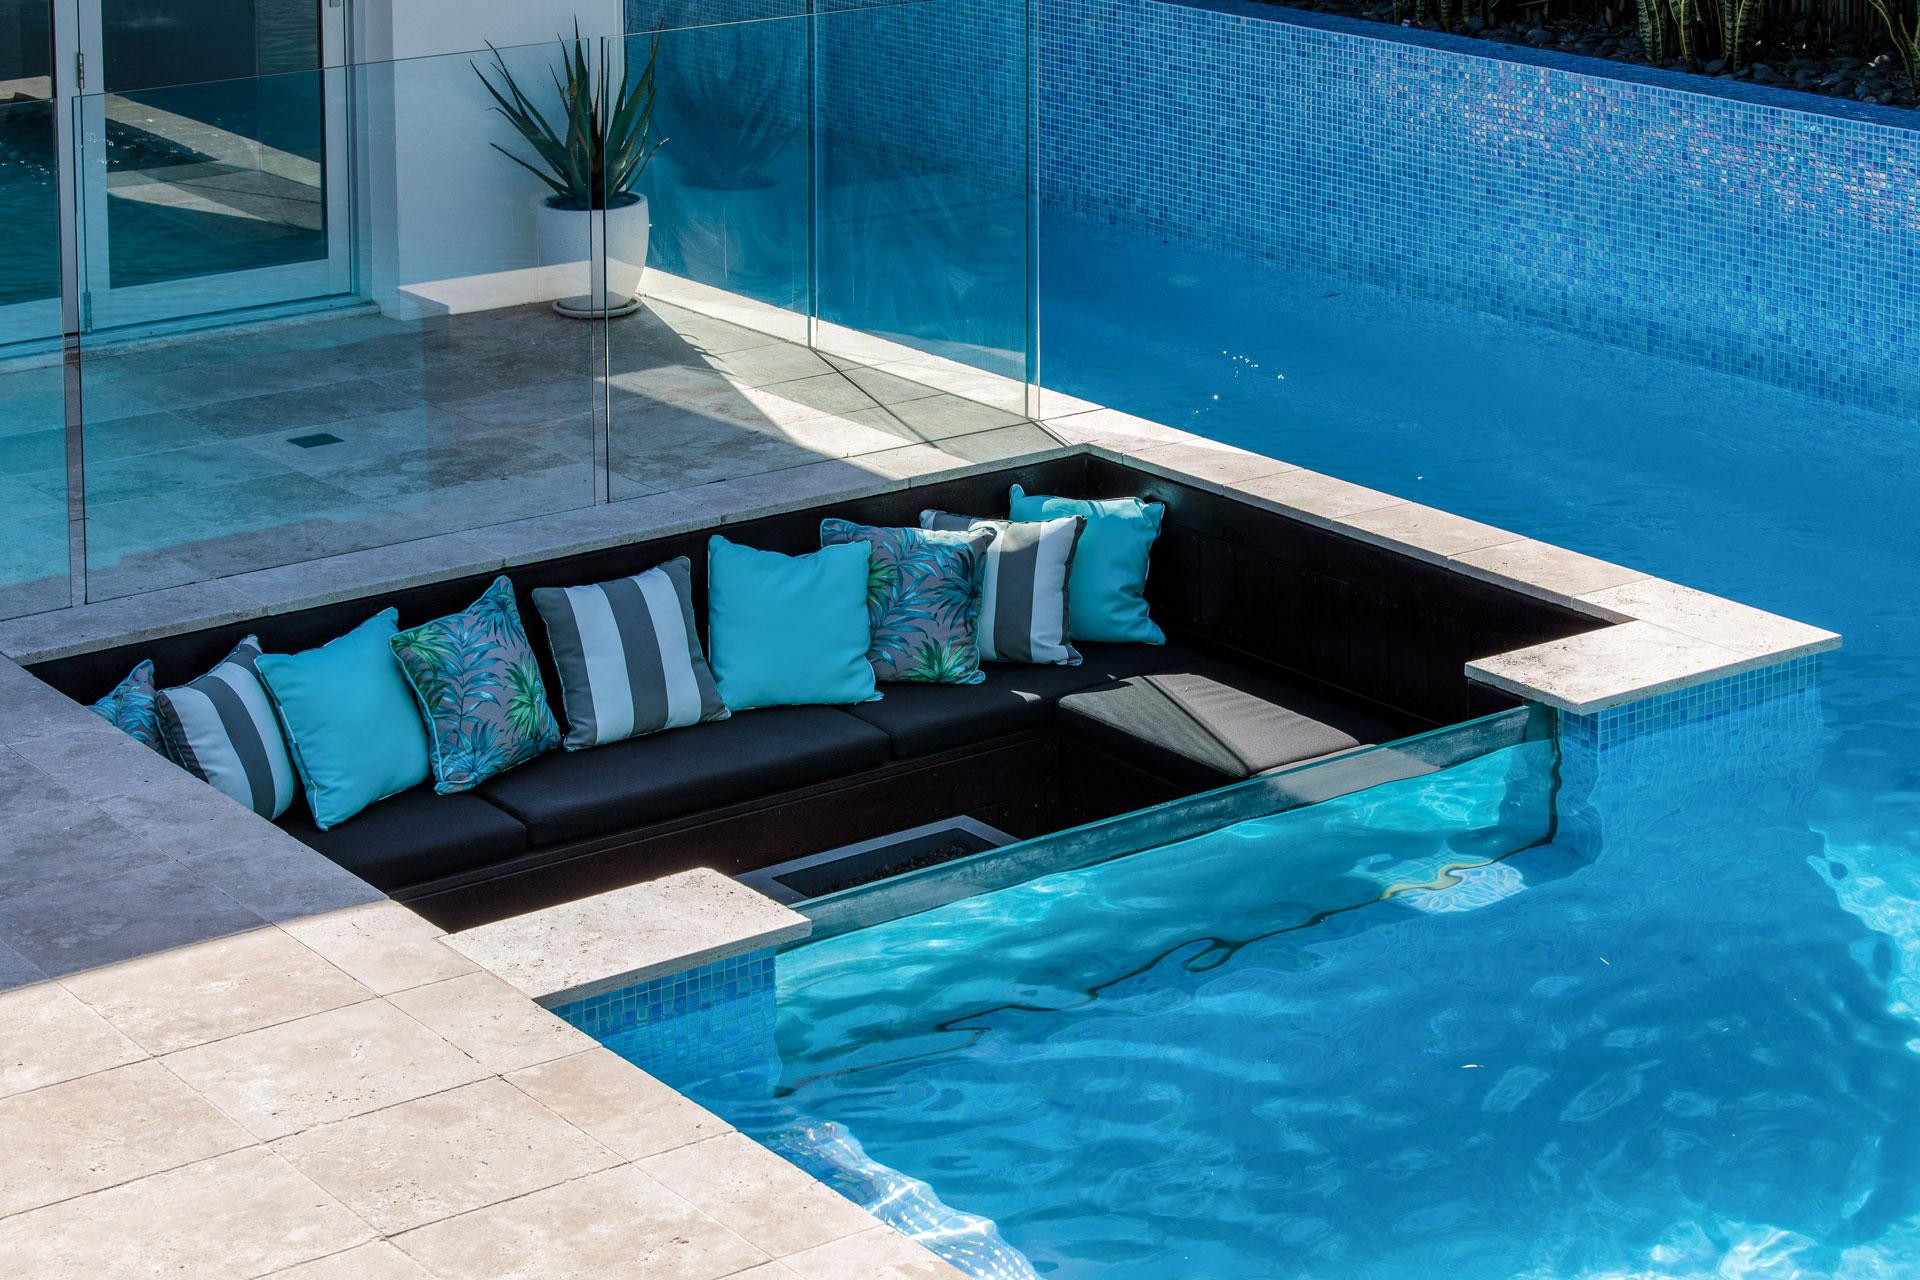 Greenhills Beach Lap Pool - Crystal Pools Sydney Pool Builder